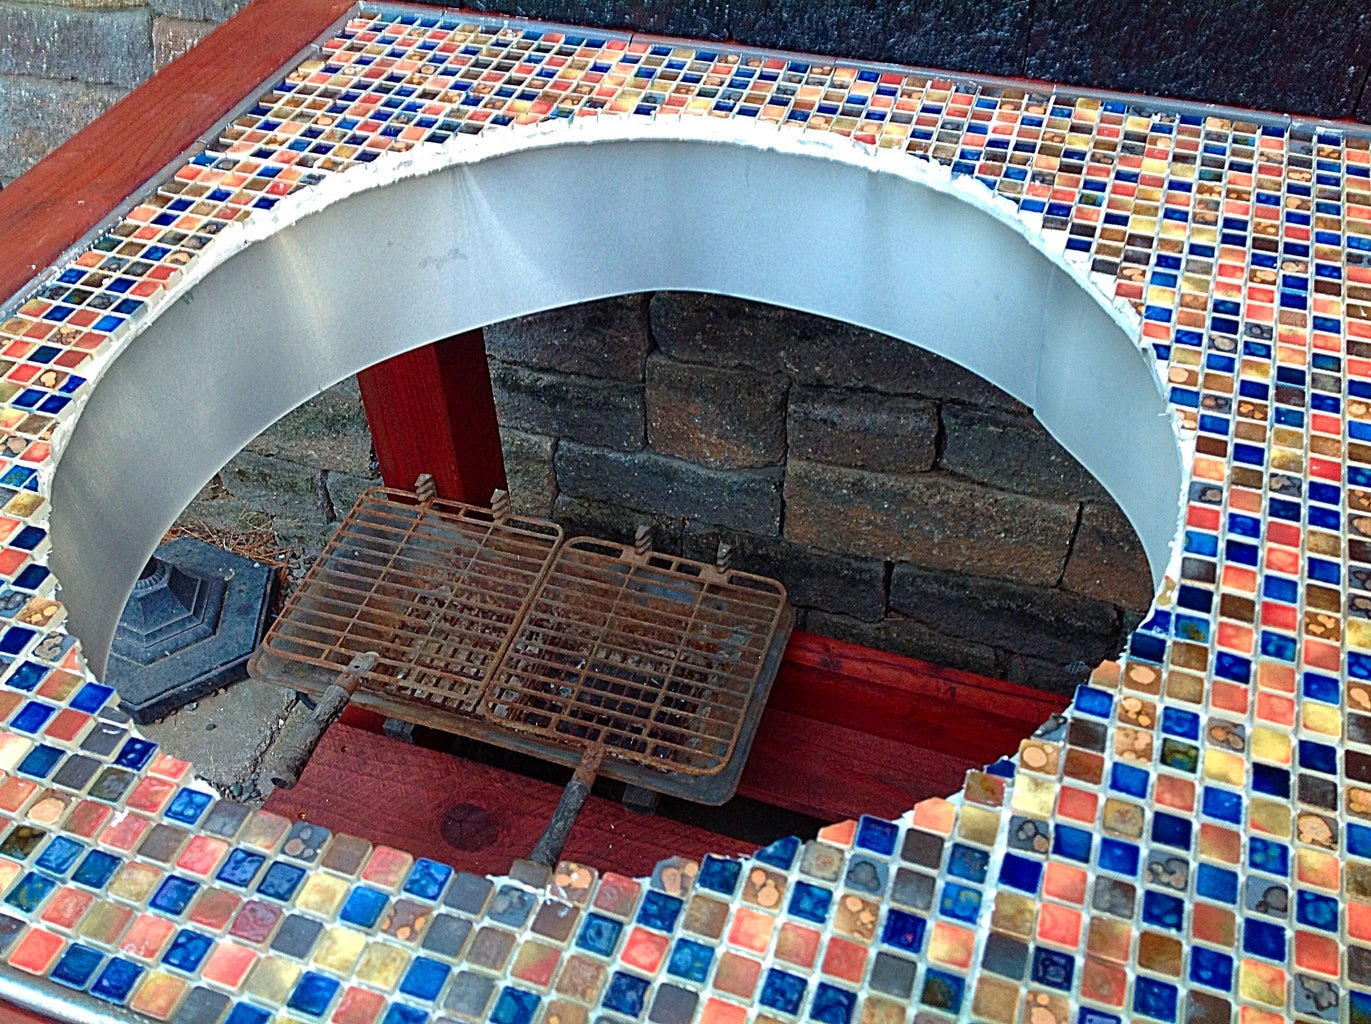 Tile & Brick